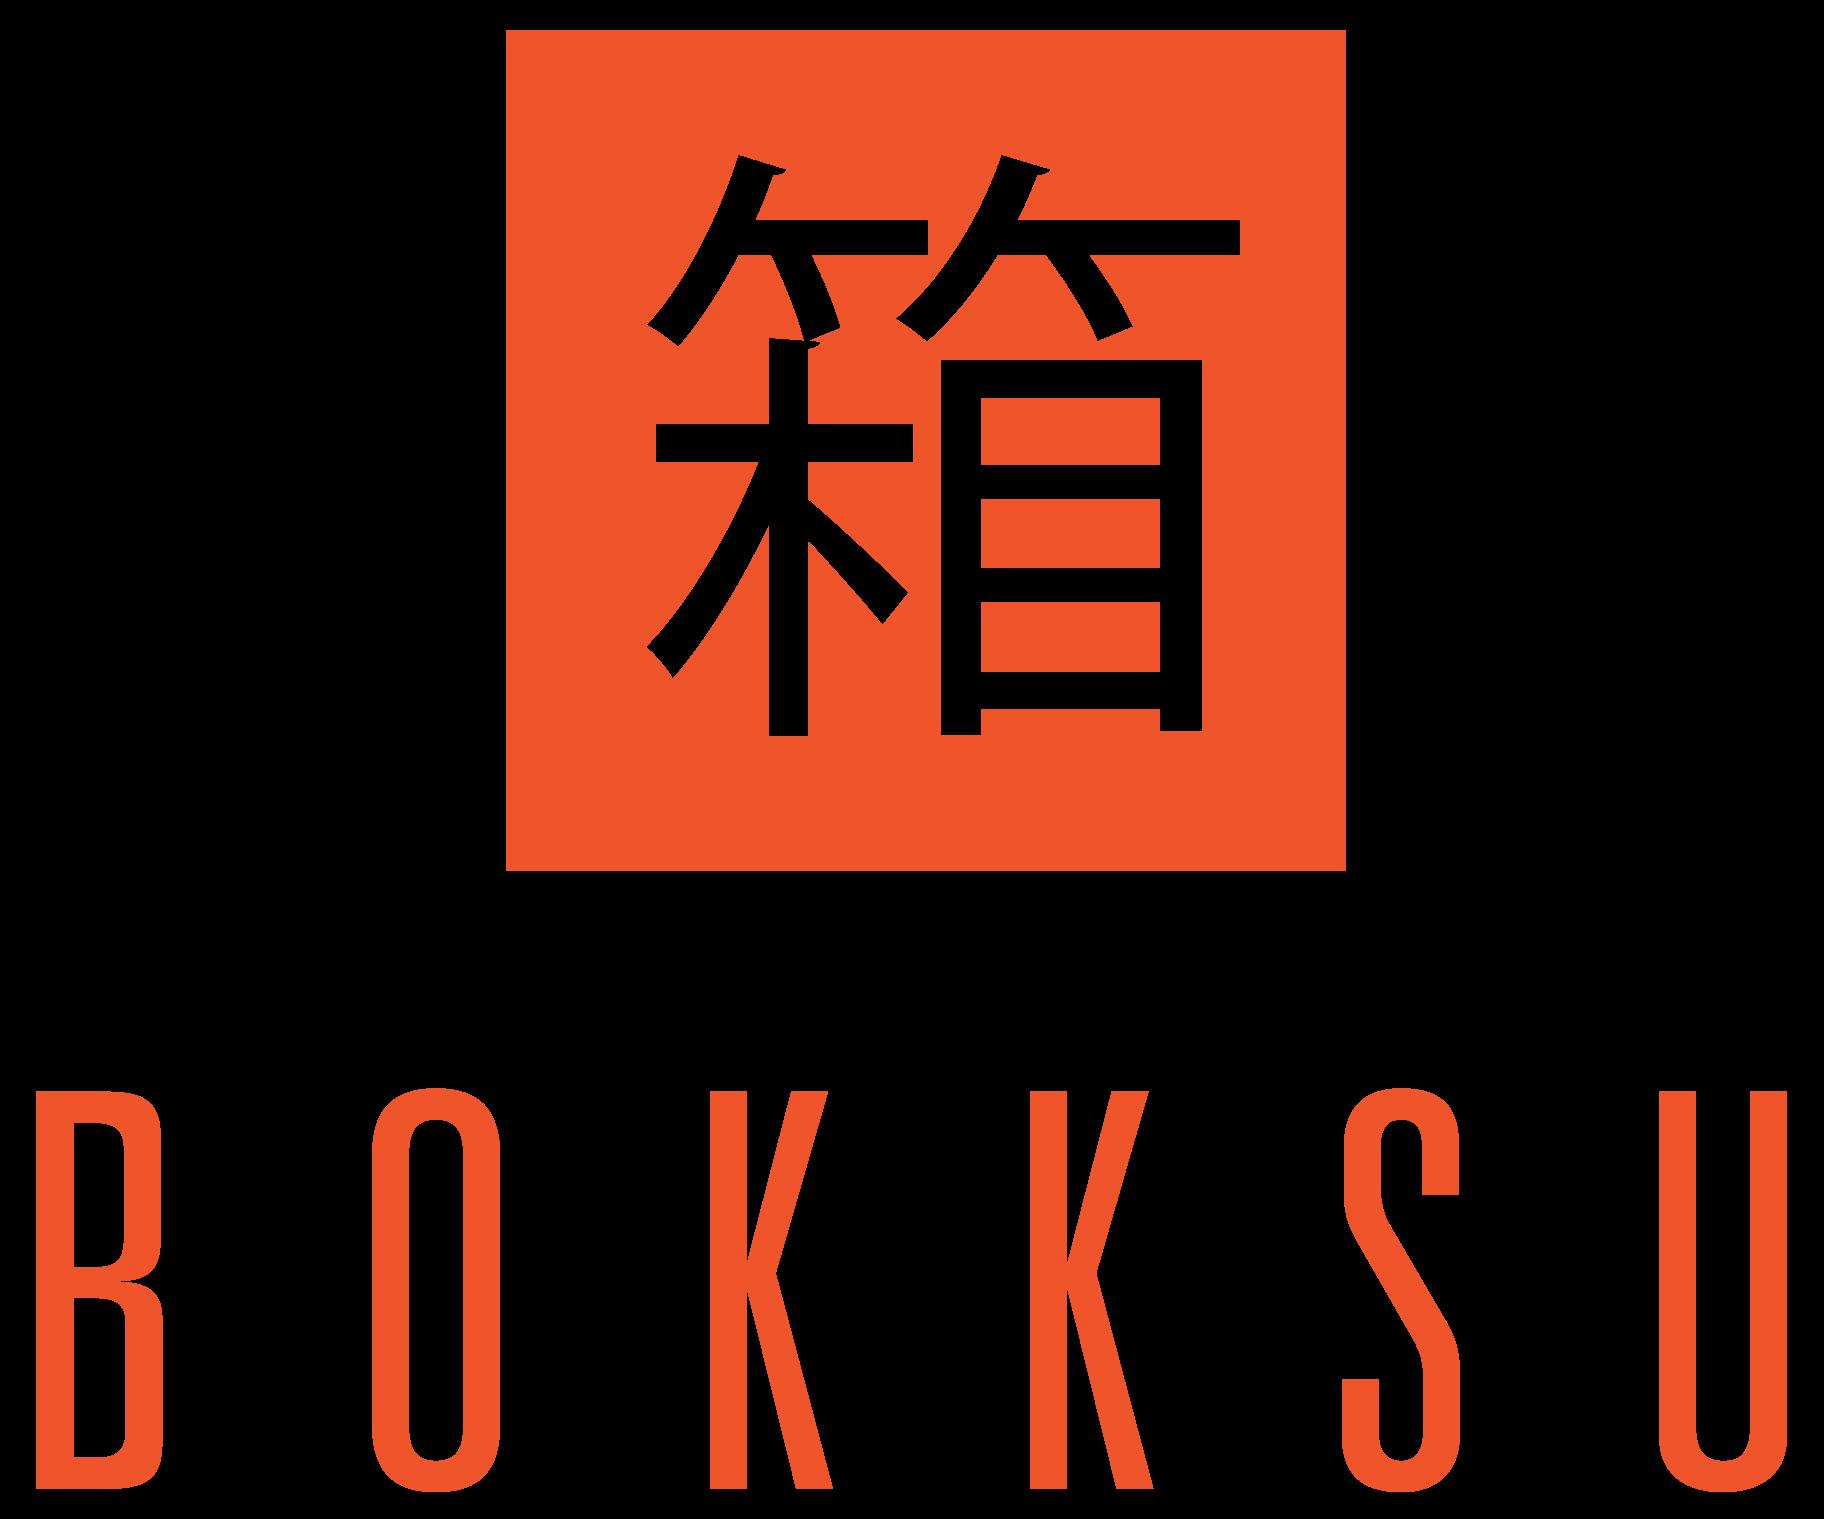 Bokksu